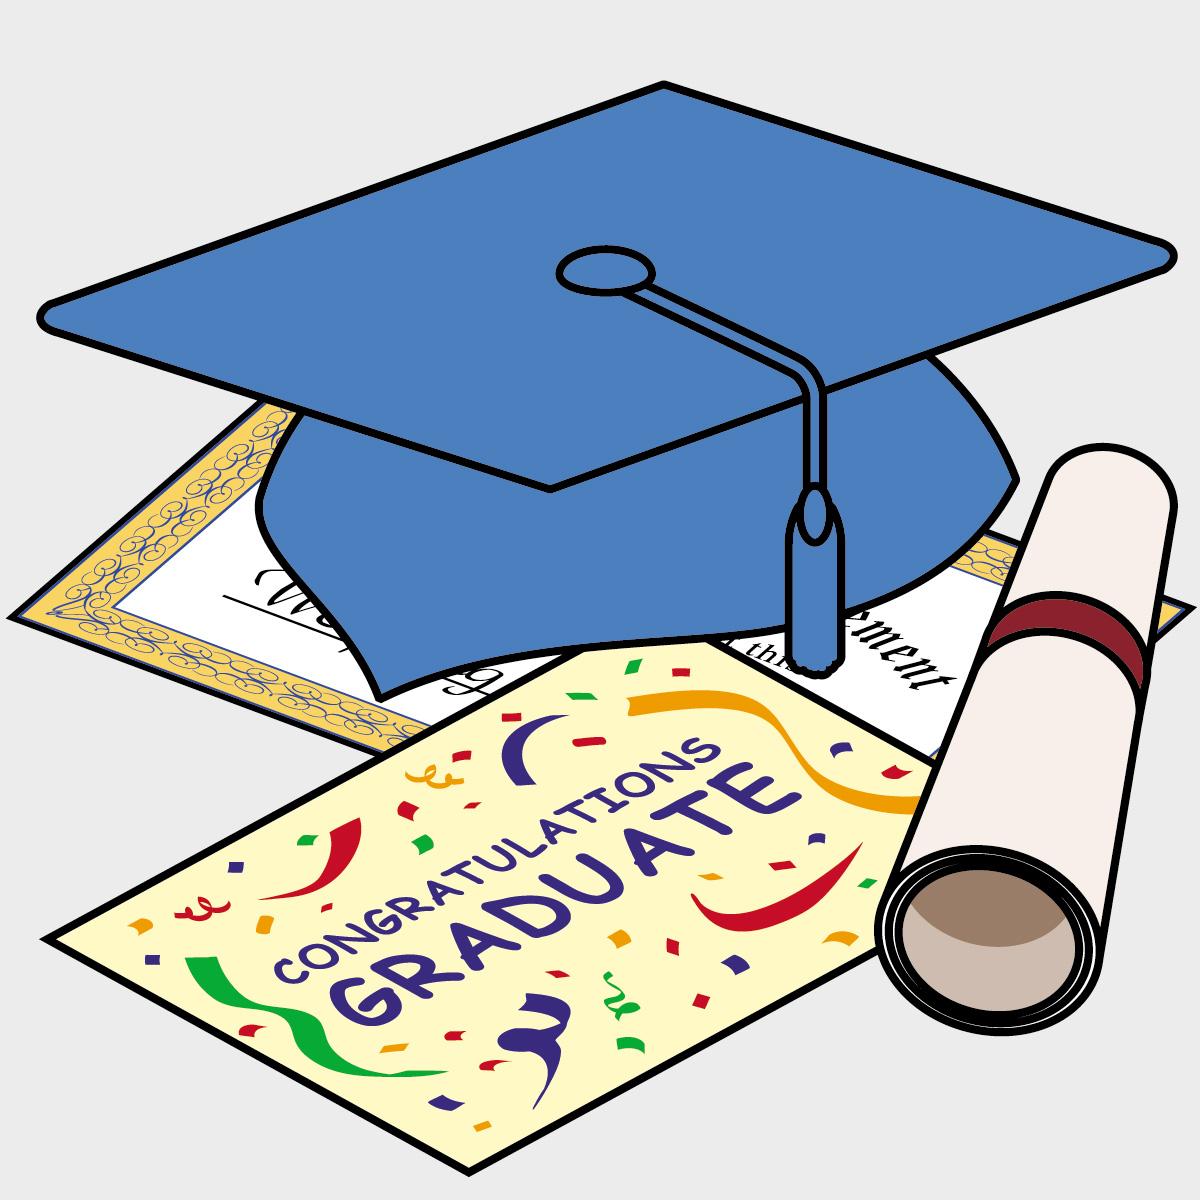 Graduation Cap Gown Clip Art Image Search Results